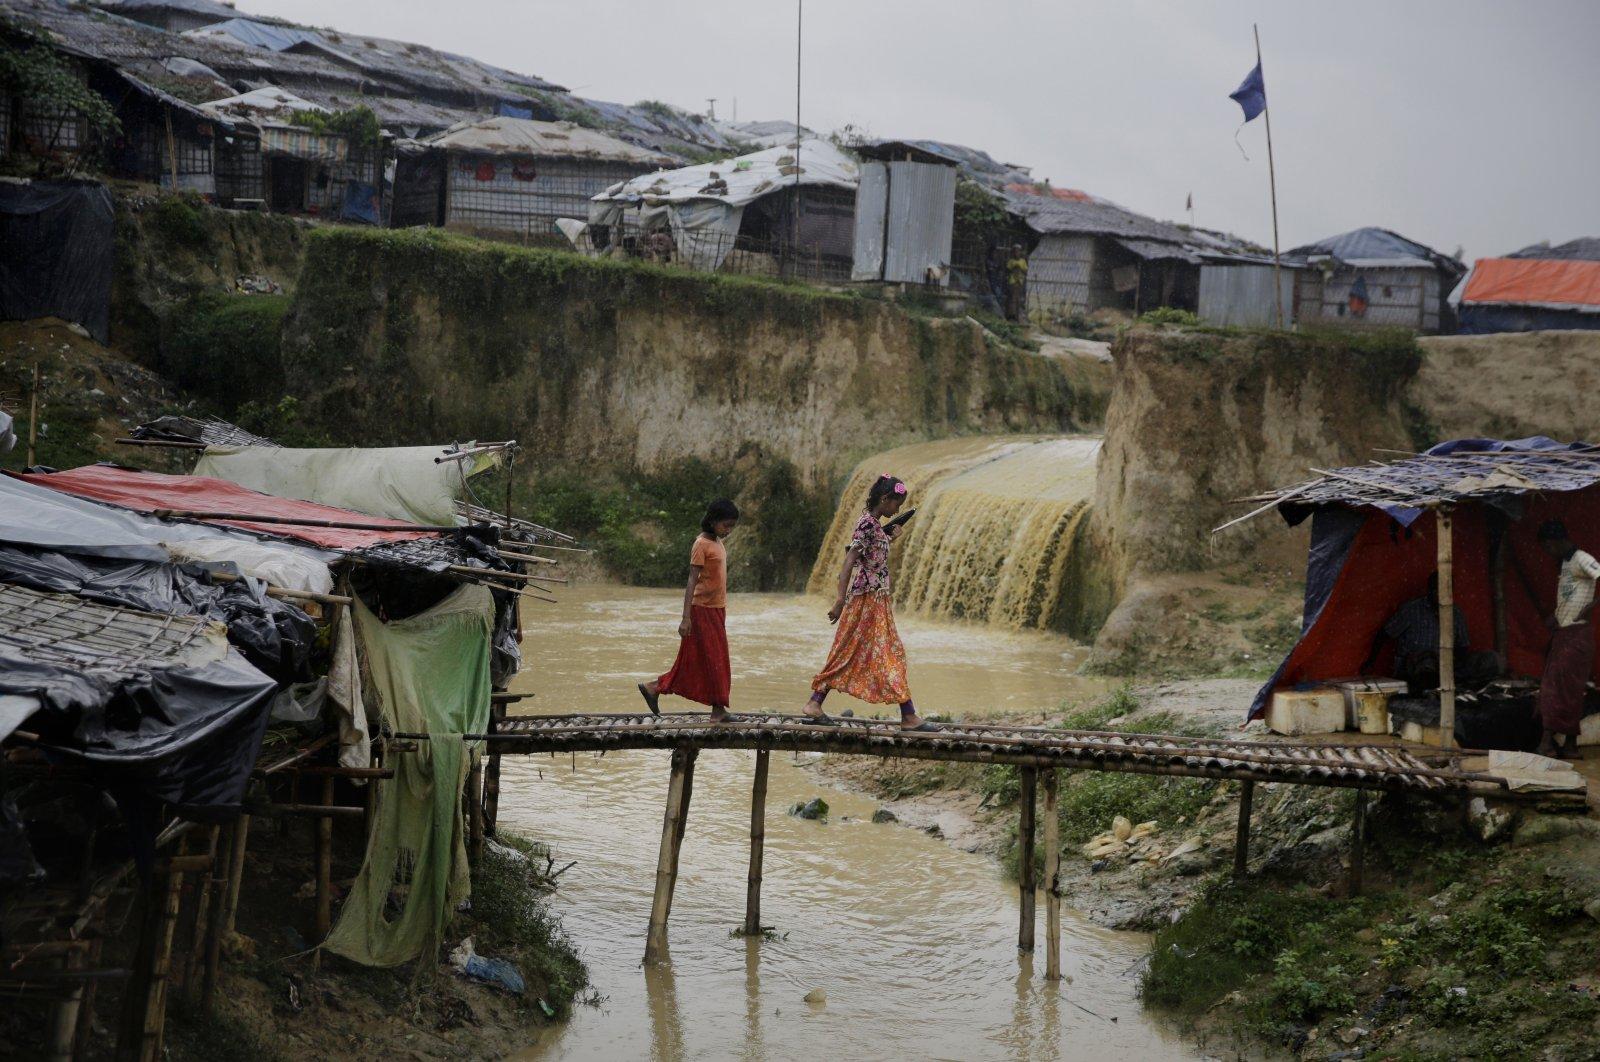 Rohingya refugee girls cross a makeshift bamboo bridge at Kutupalong refugee camp, Bangladesh, Aug. 28, 2018. (AP Photo)